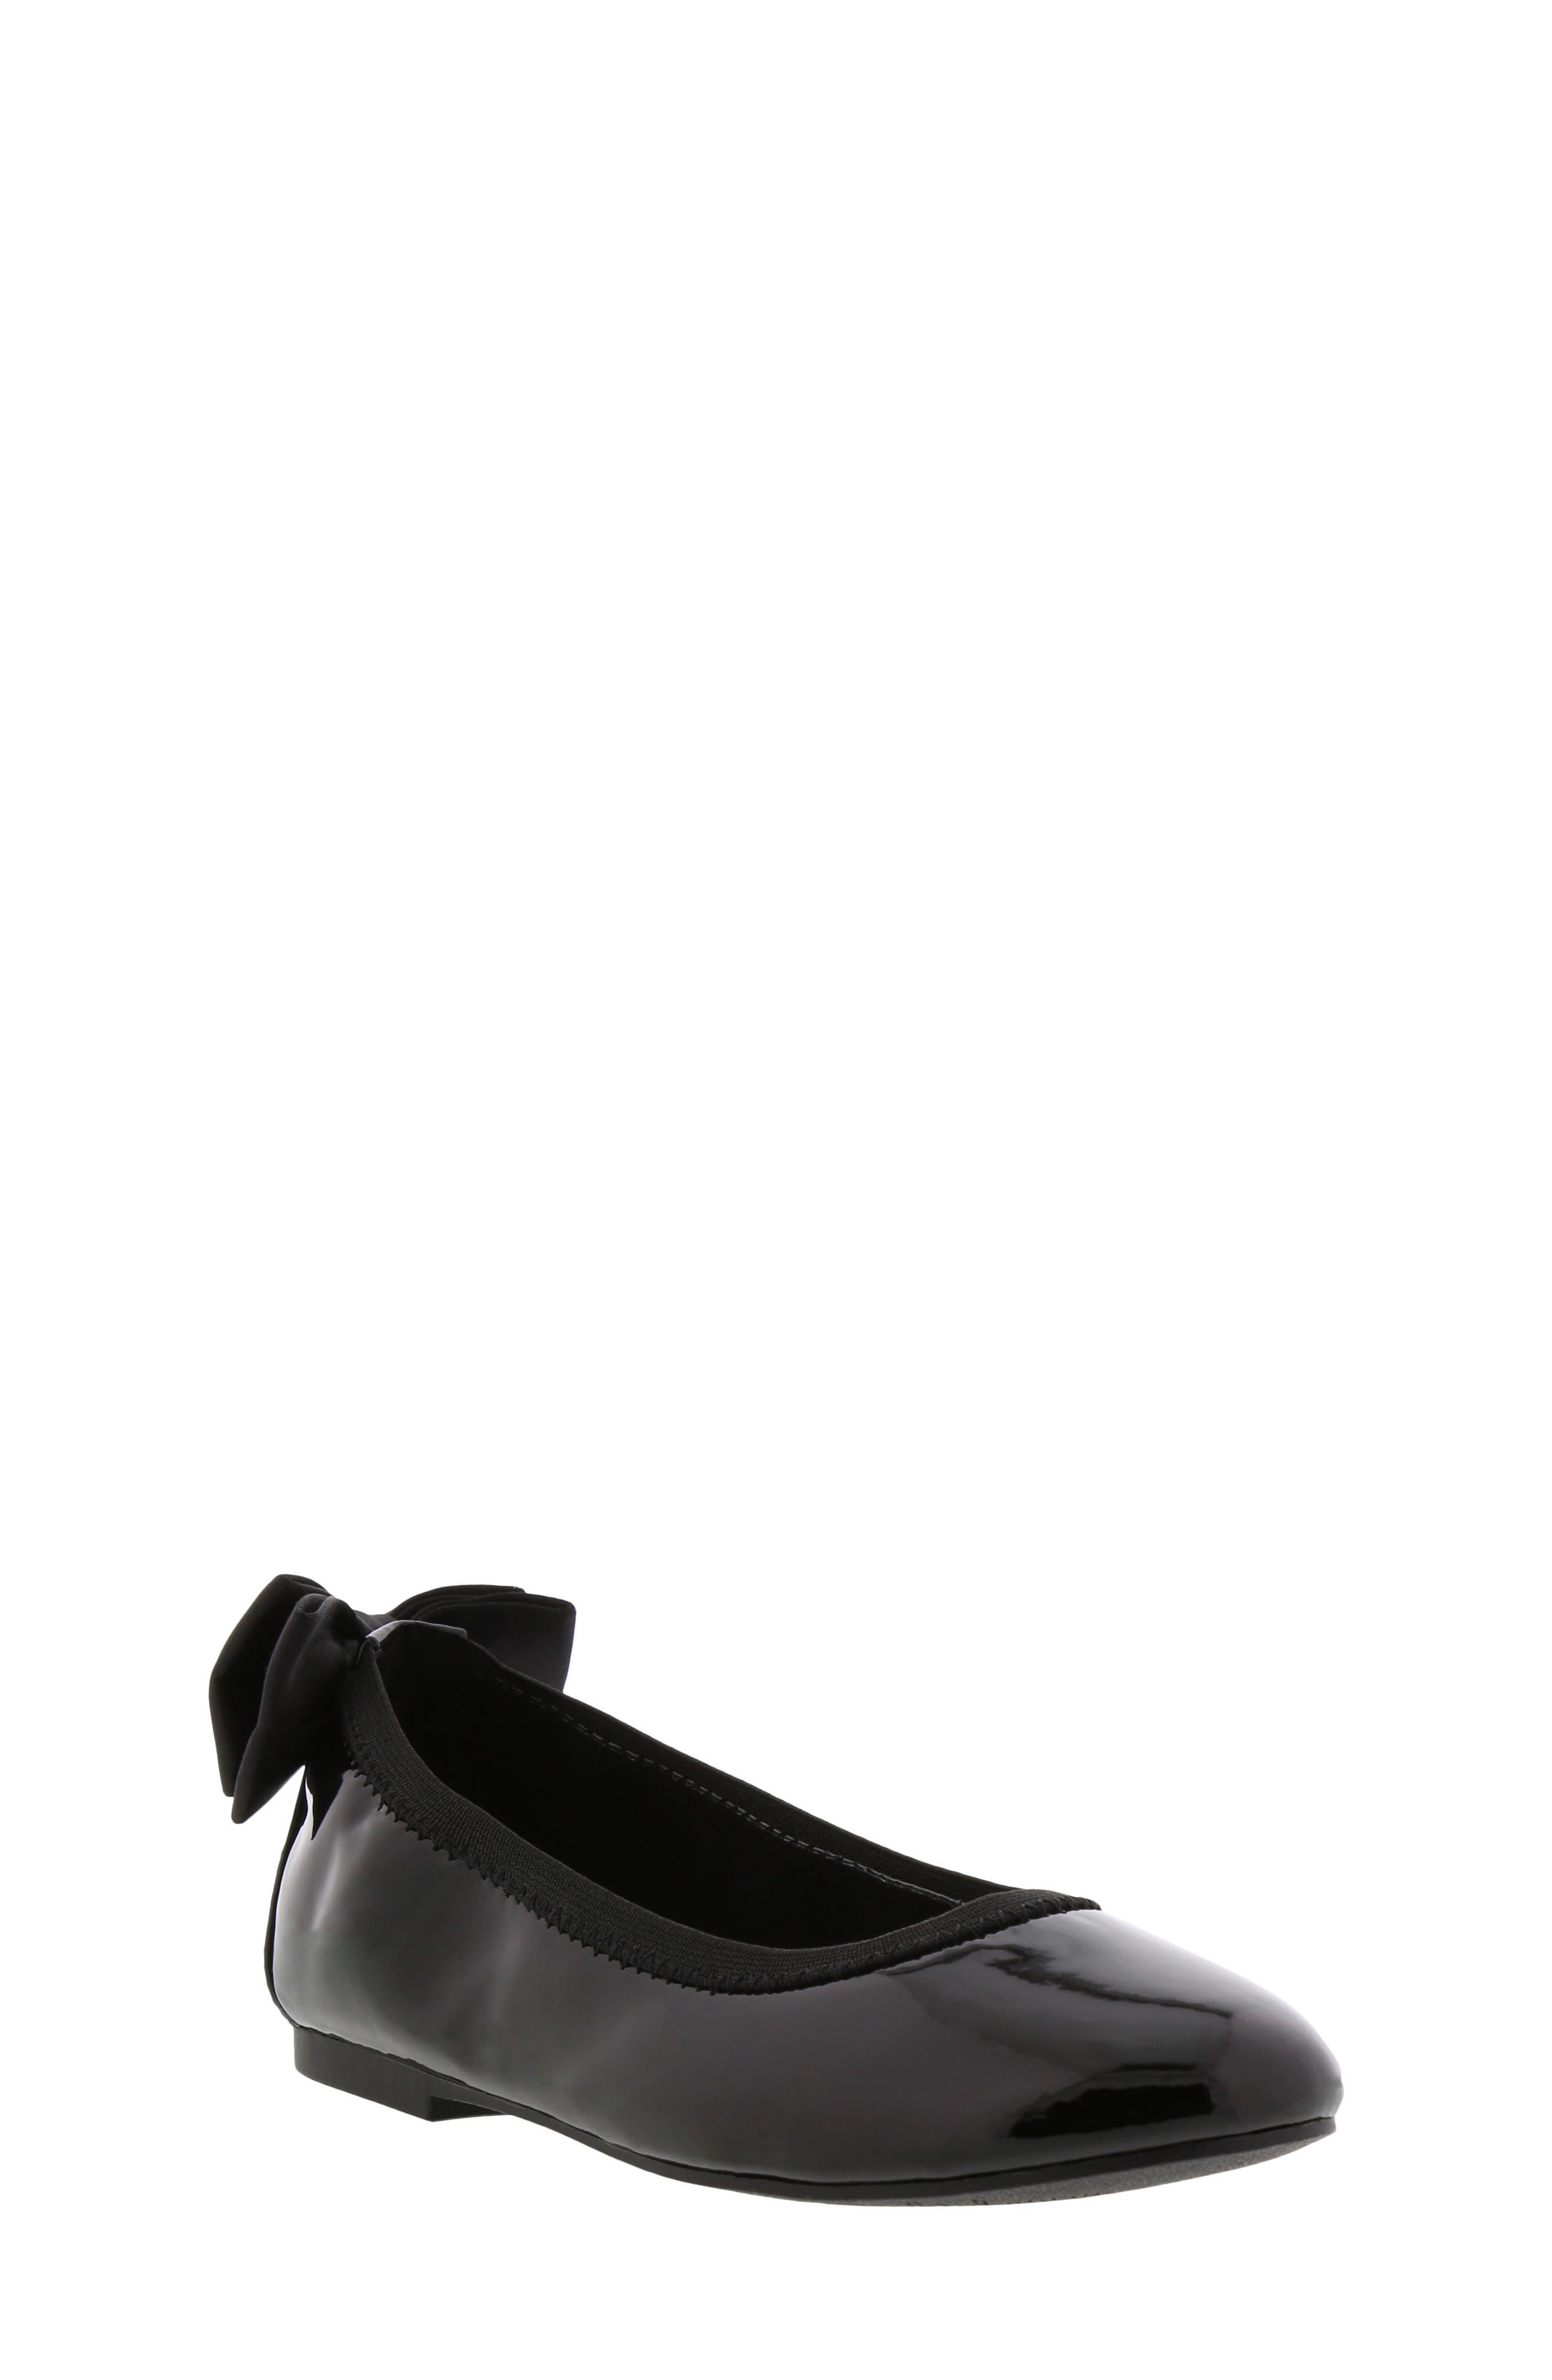 SAM EDELMAN, Felicia Esmerelda Ballet Flat, Main thumbnail 1, color, BLACK PATENT